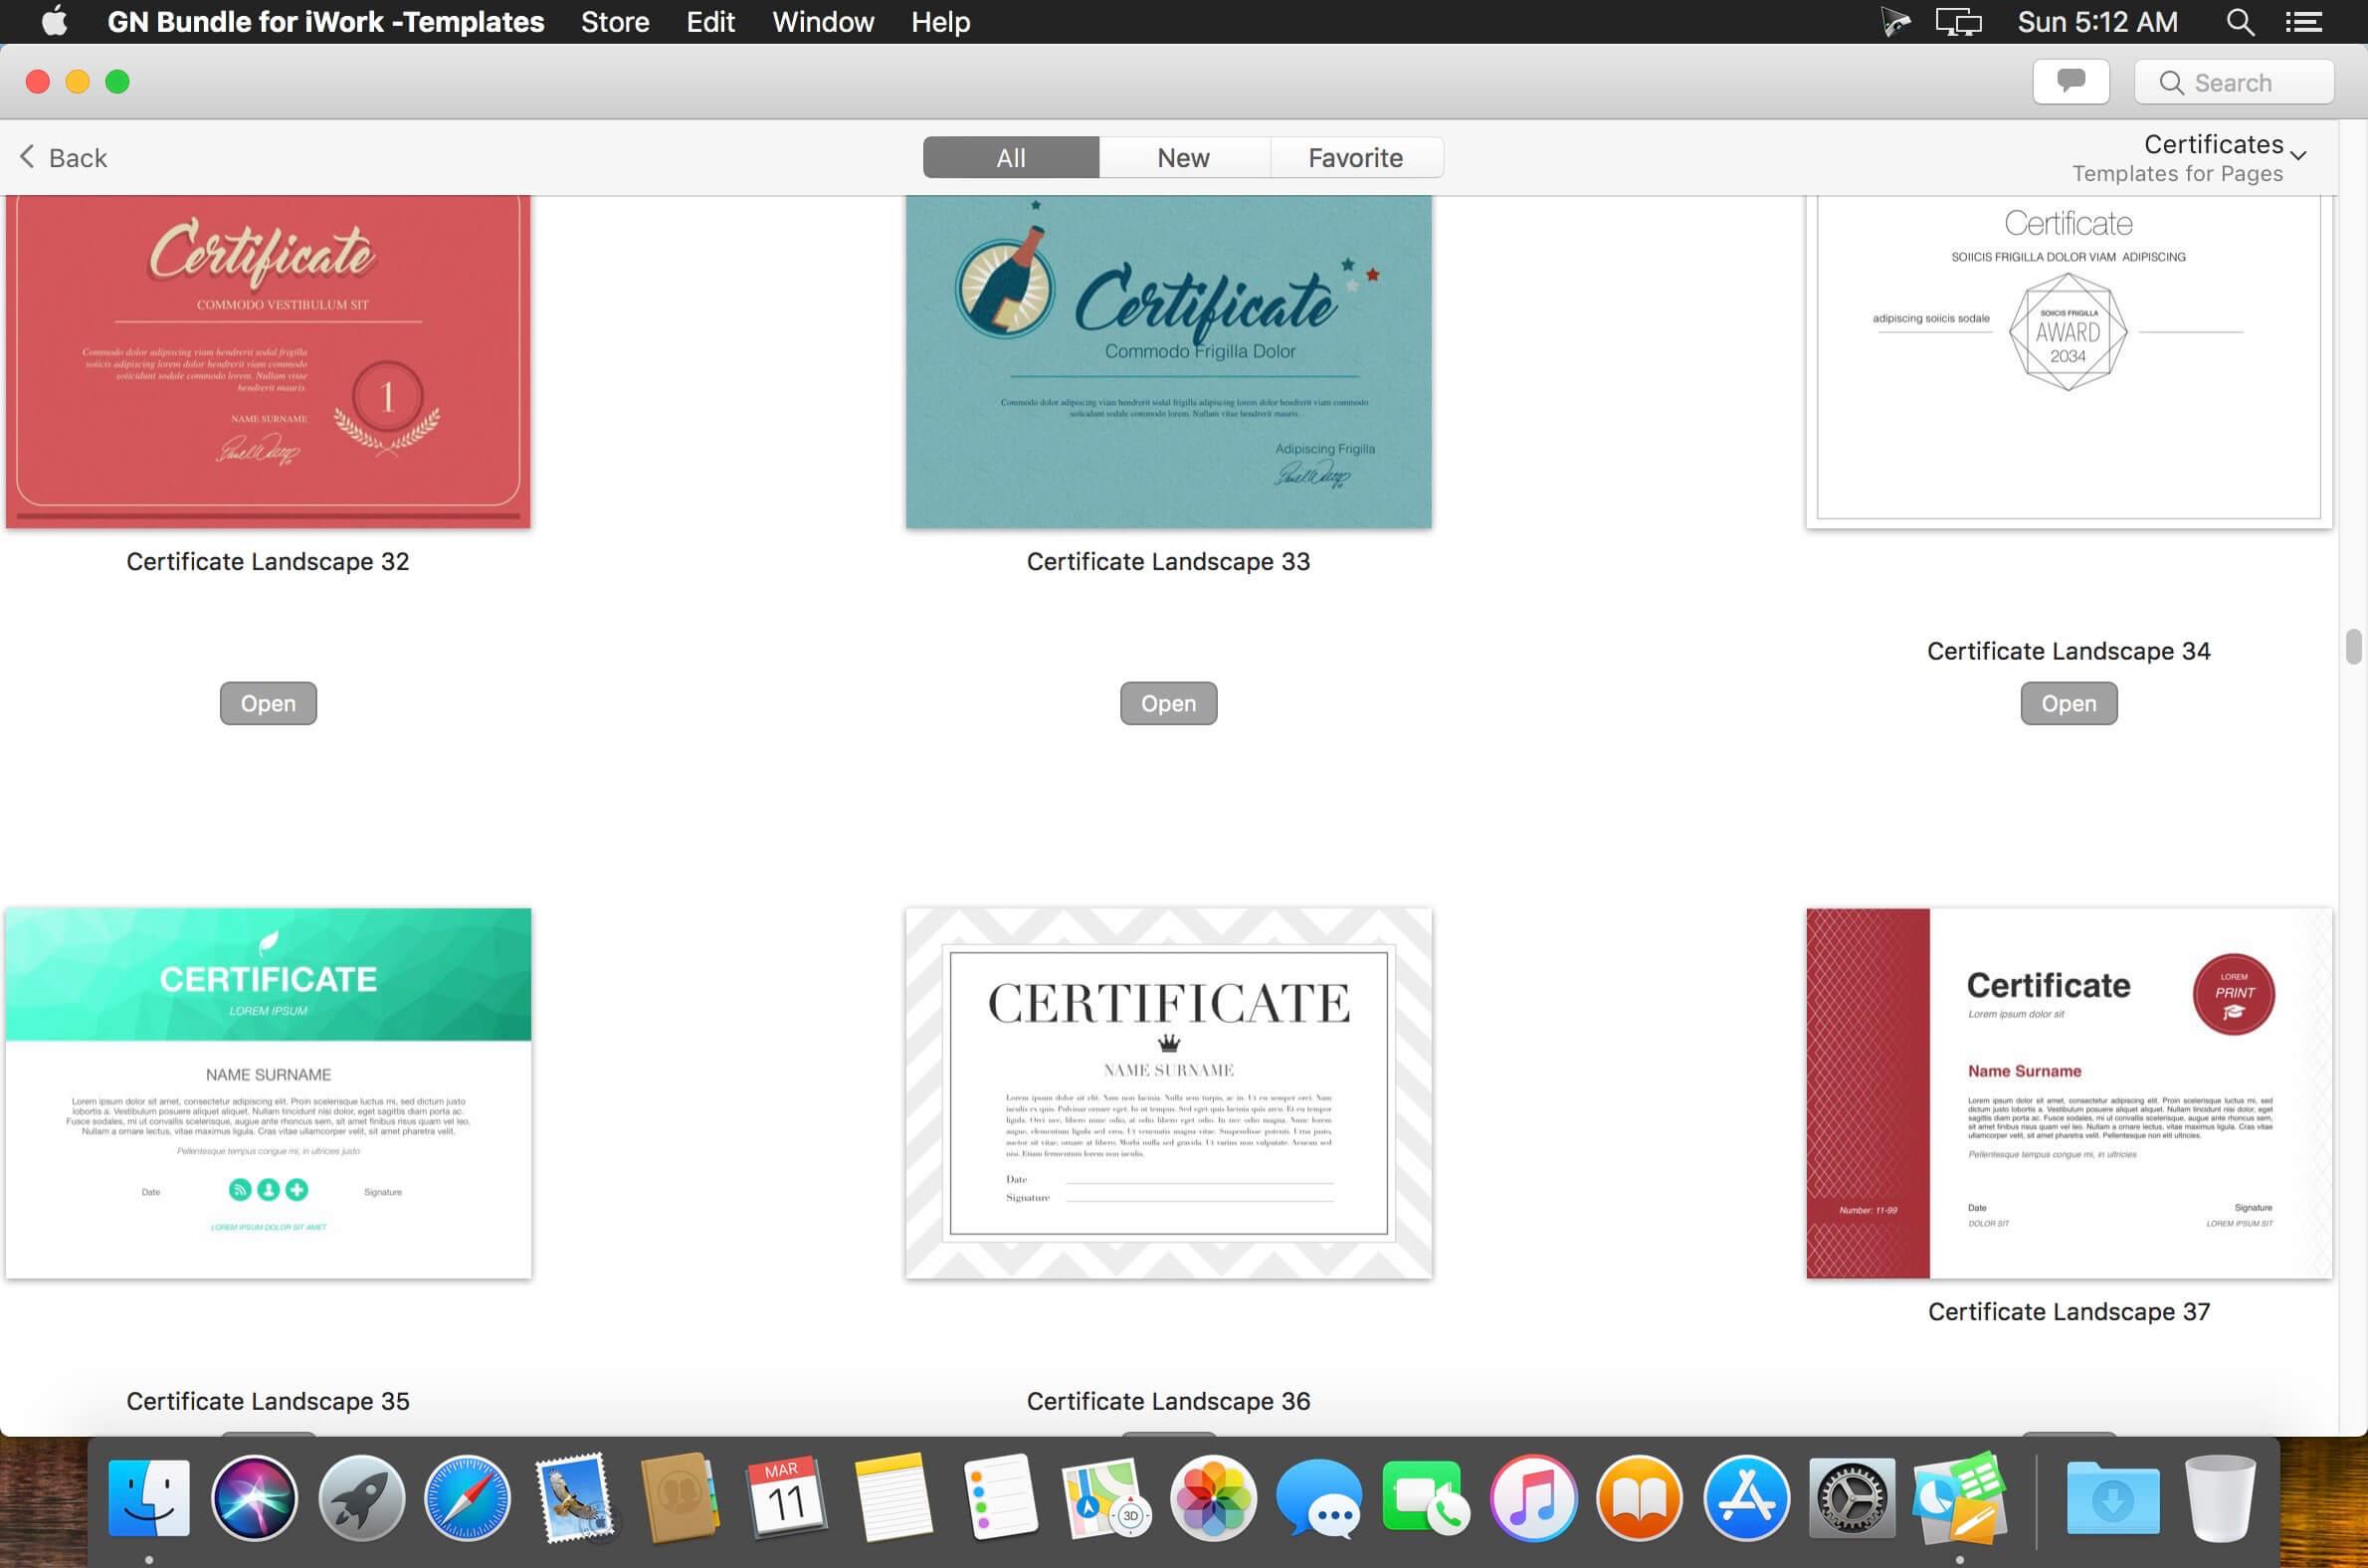 GN Bundle for iWork - Templates 6.0.1 download | macOS